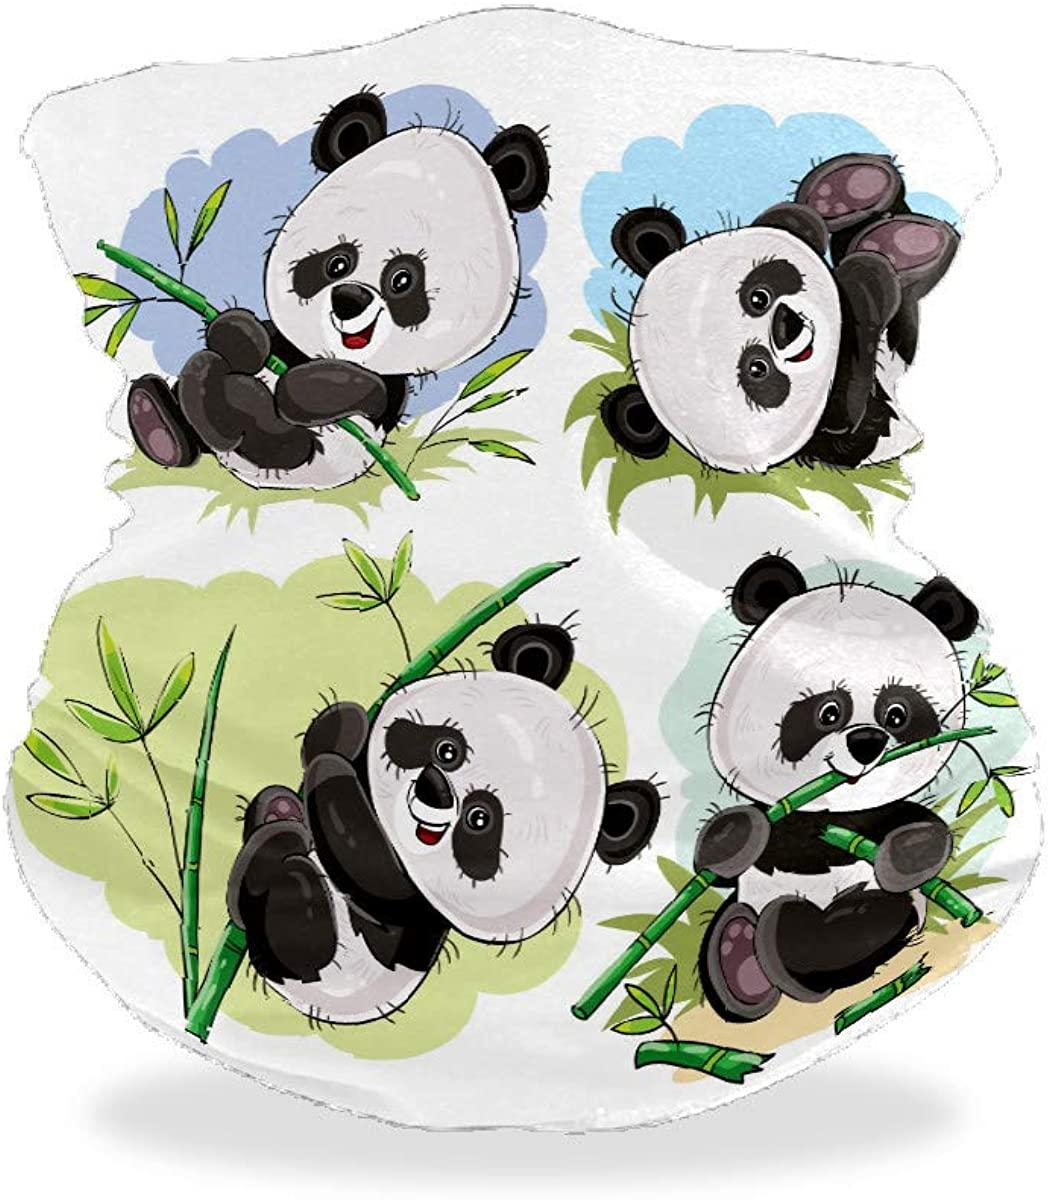 Playful Panda Bear Baby Bamboo Bandana Face Mask for Dust Wind UV Sun Product Neck Gaiter Helmet Liner Headwear Balaclava Scarf Outdoors Mask for Women Men Adults Kids